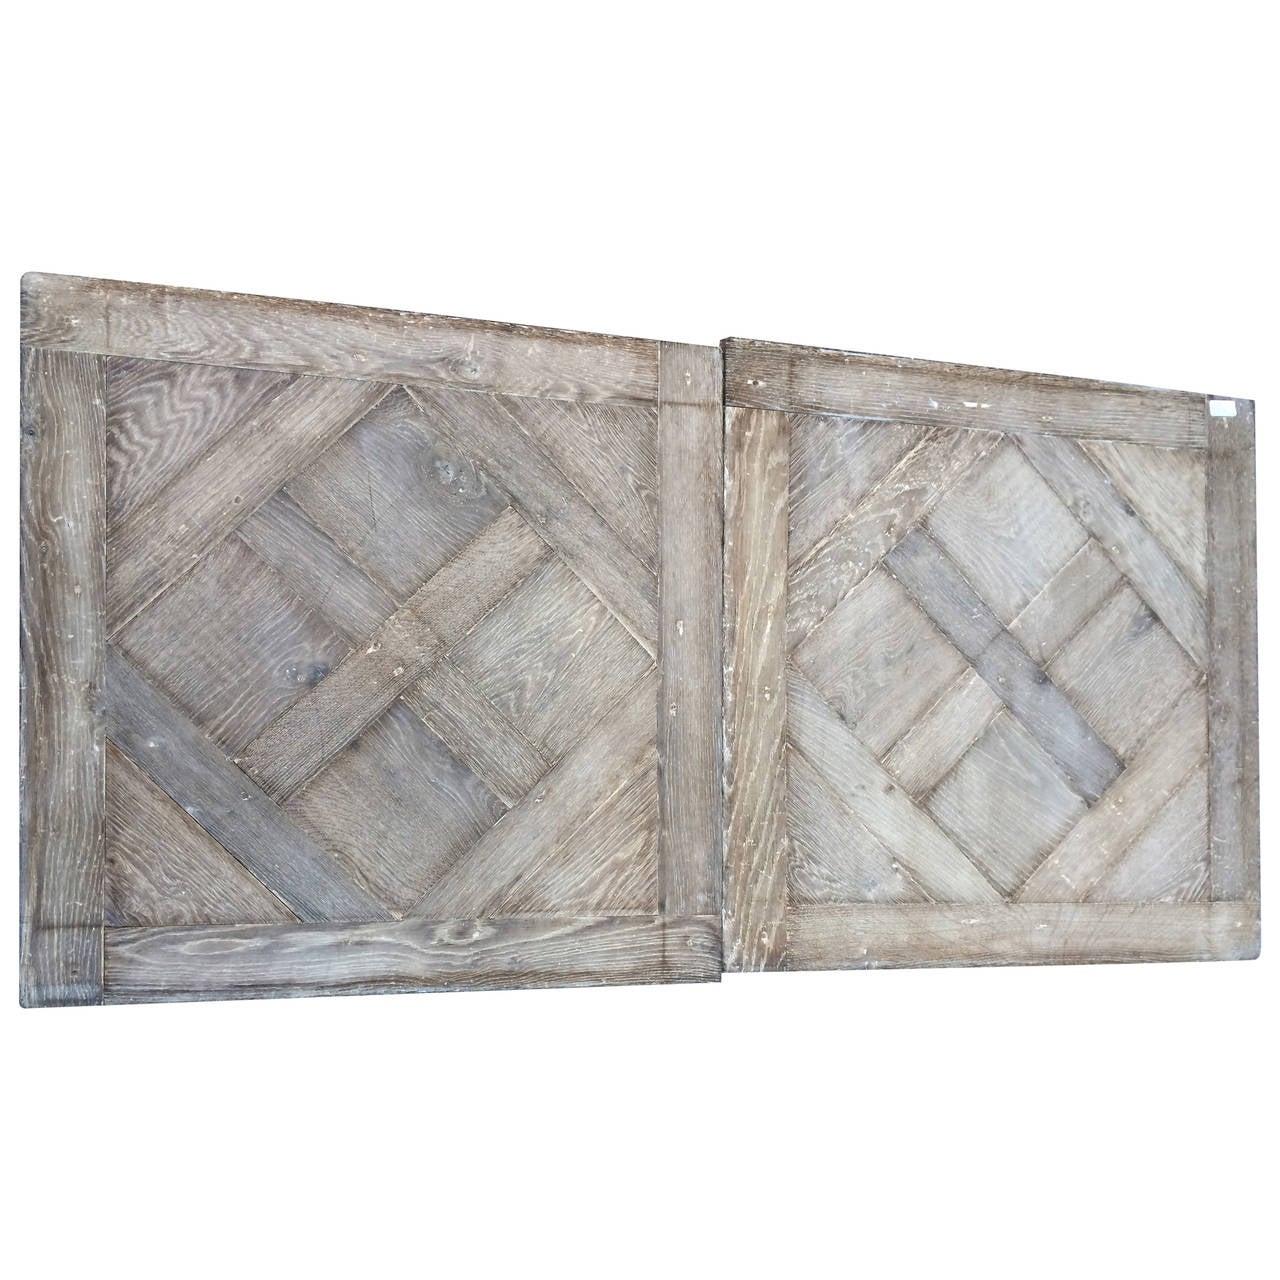 19th century original french parquet flooring at 1stdibs. Black Bedroom Furniture Sets. Home Design Ideas